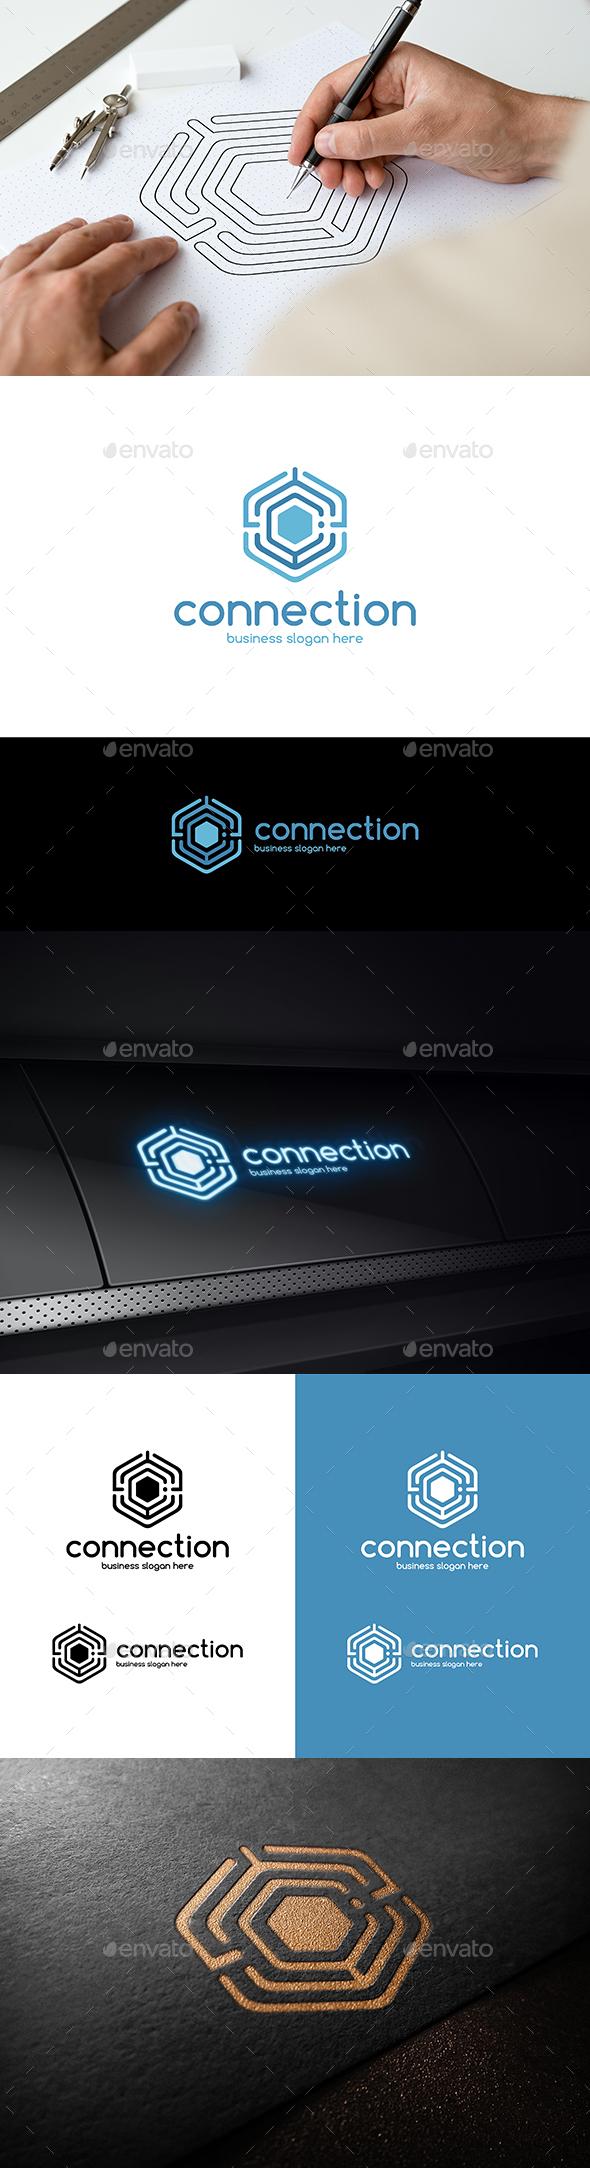 Connection Hexagon Technologies Logo - Letter C - Symbols Logo Templates